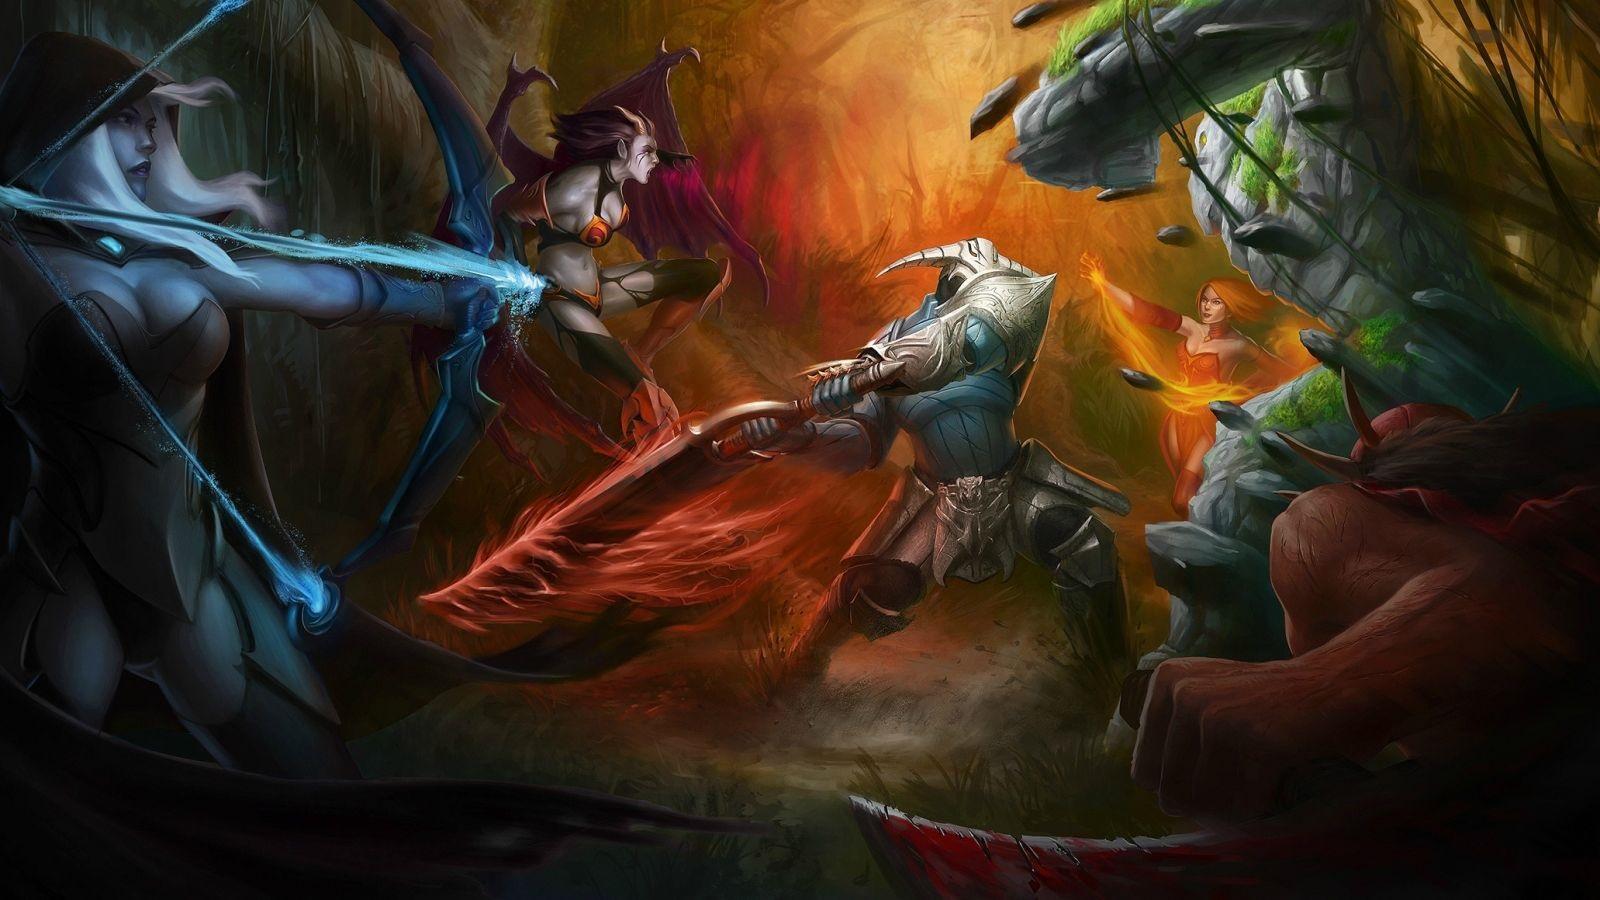 Sven,Lina,Drow Ranger,Tiny,Queen of Pain pc wallpaper Dota 2